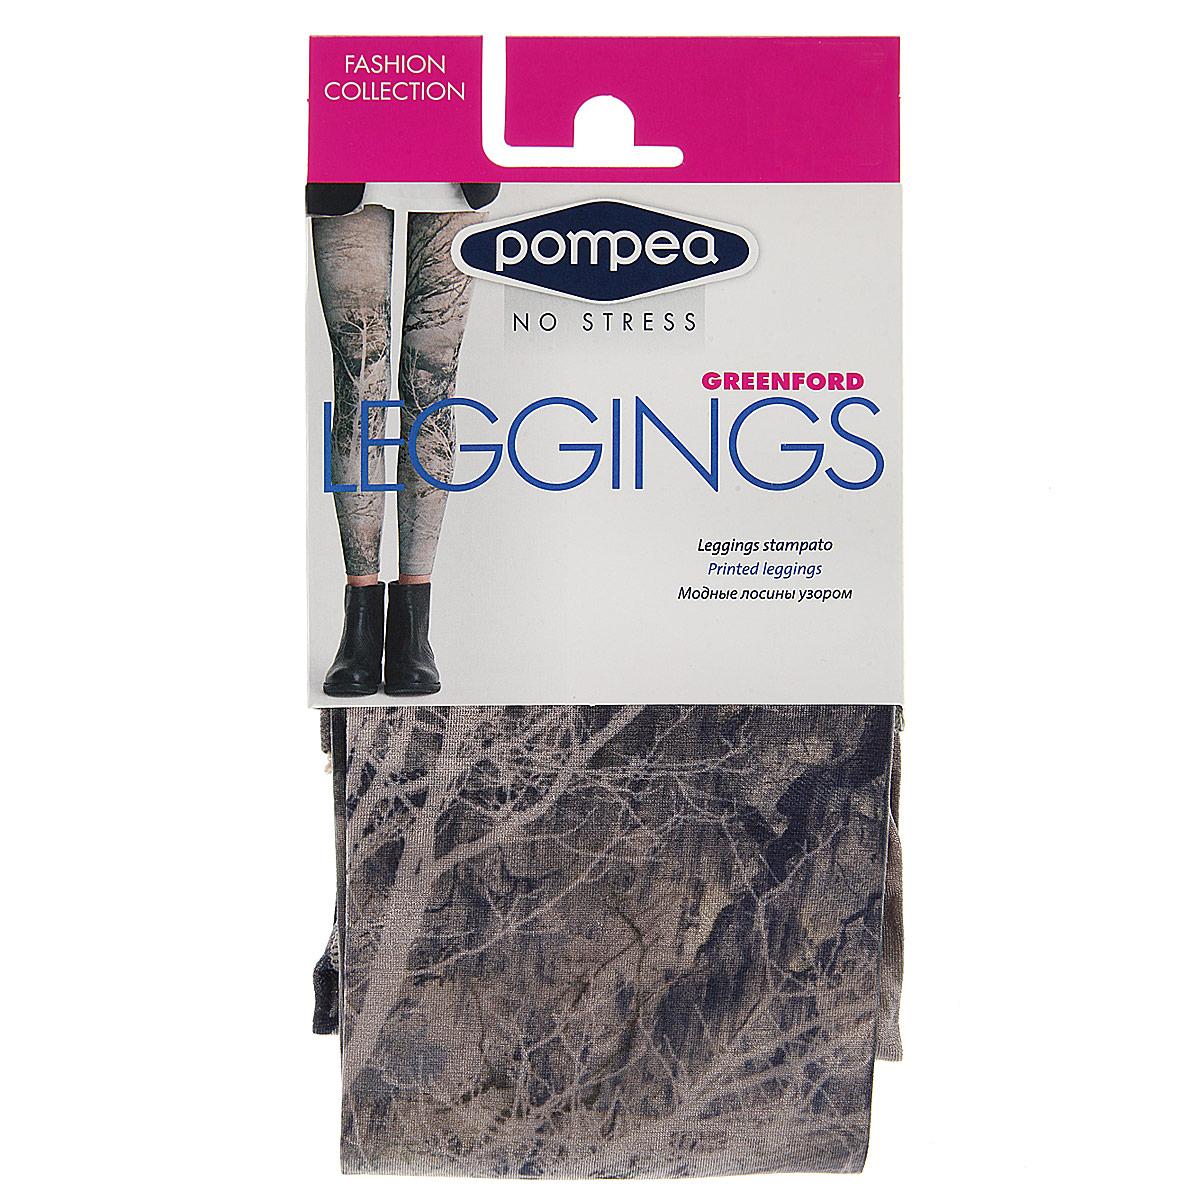 Леггинсы женские Pompea Leggings Greenford Fashion, цвет: Nature (природа). Размер 2 (1/2-S)